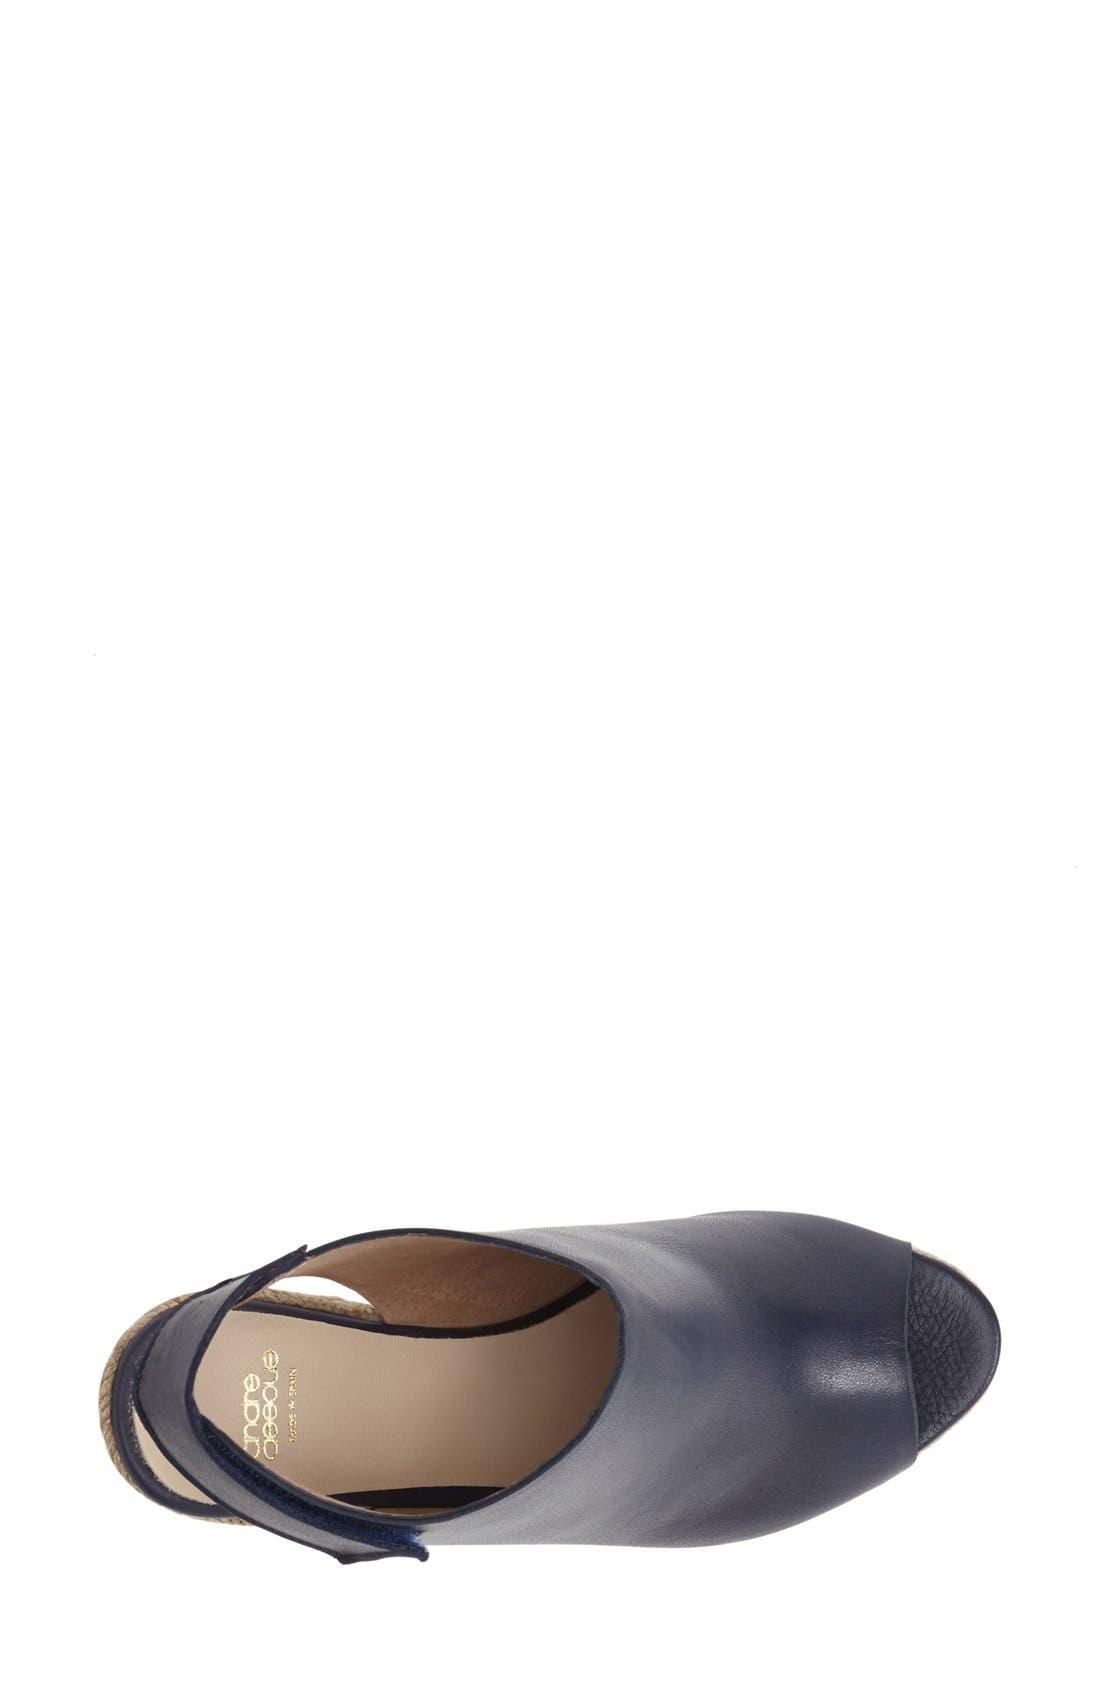 Alternate Image 3  - André Assous 'Beatrice' Wedge Sandal (Women)